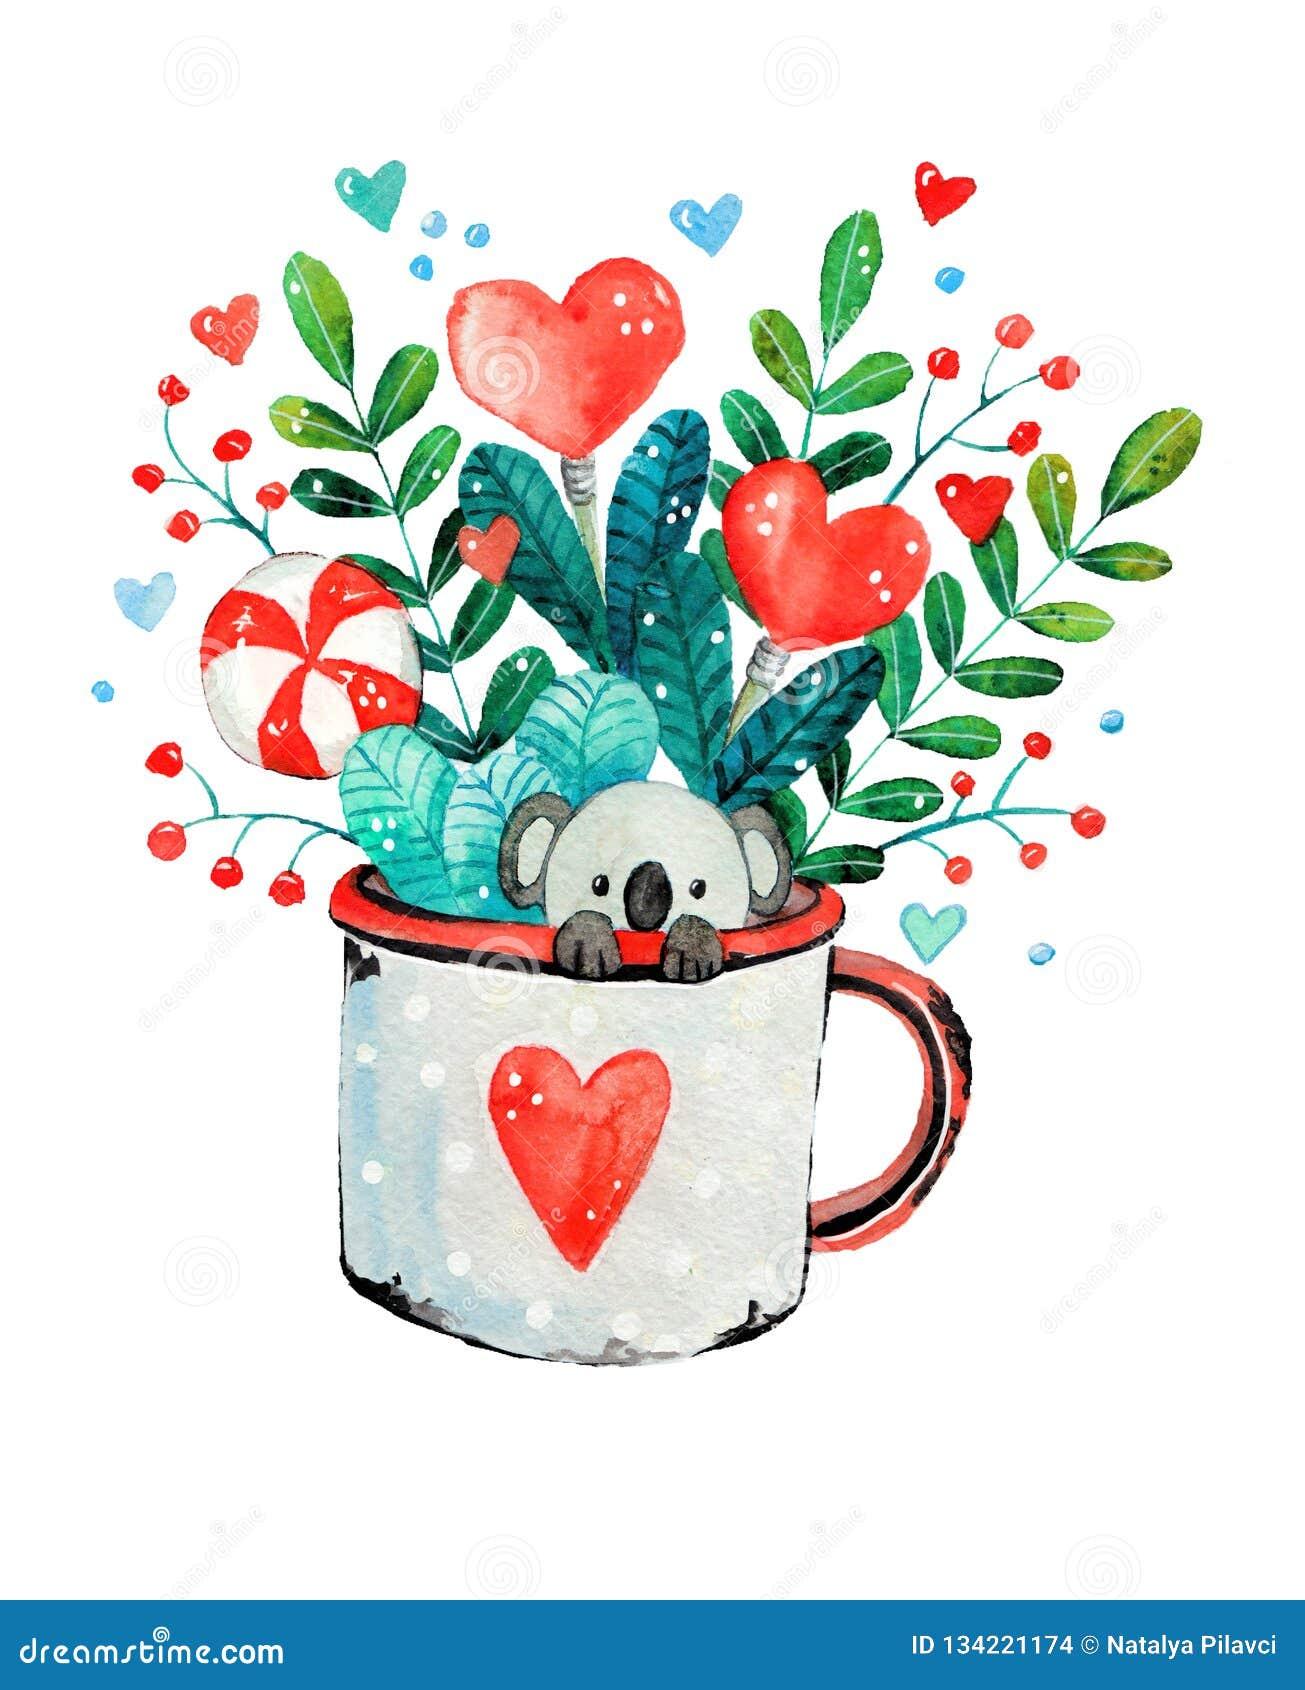 Illustration Of A Cute Little Koala In A Mug Stock Illustration Illustration Of Illustrataplusmn Decorative 134221174